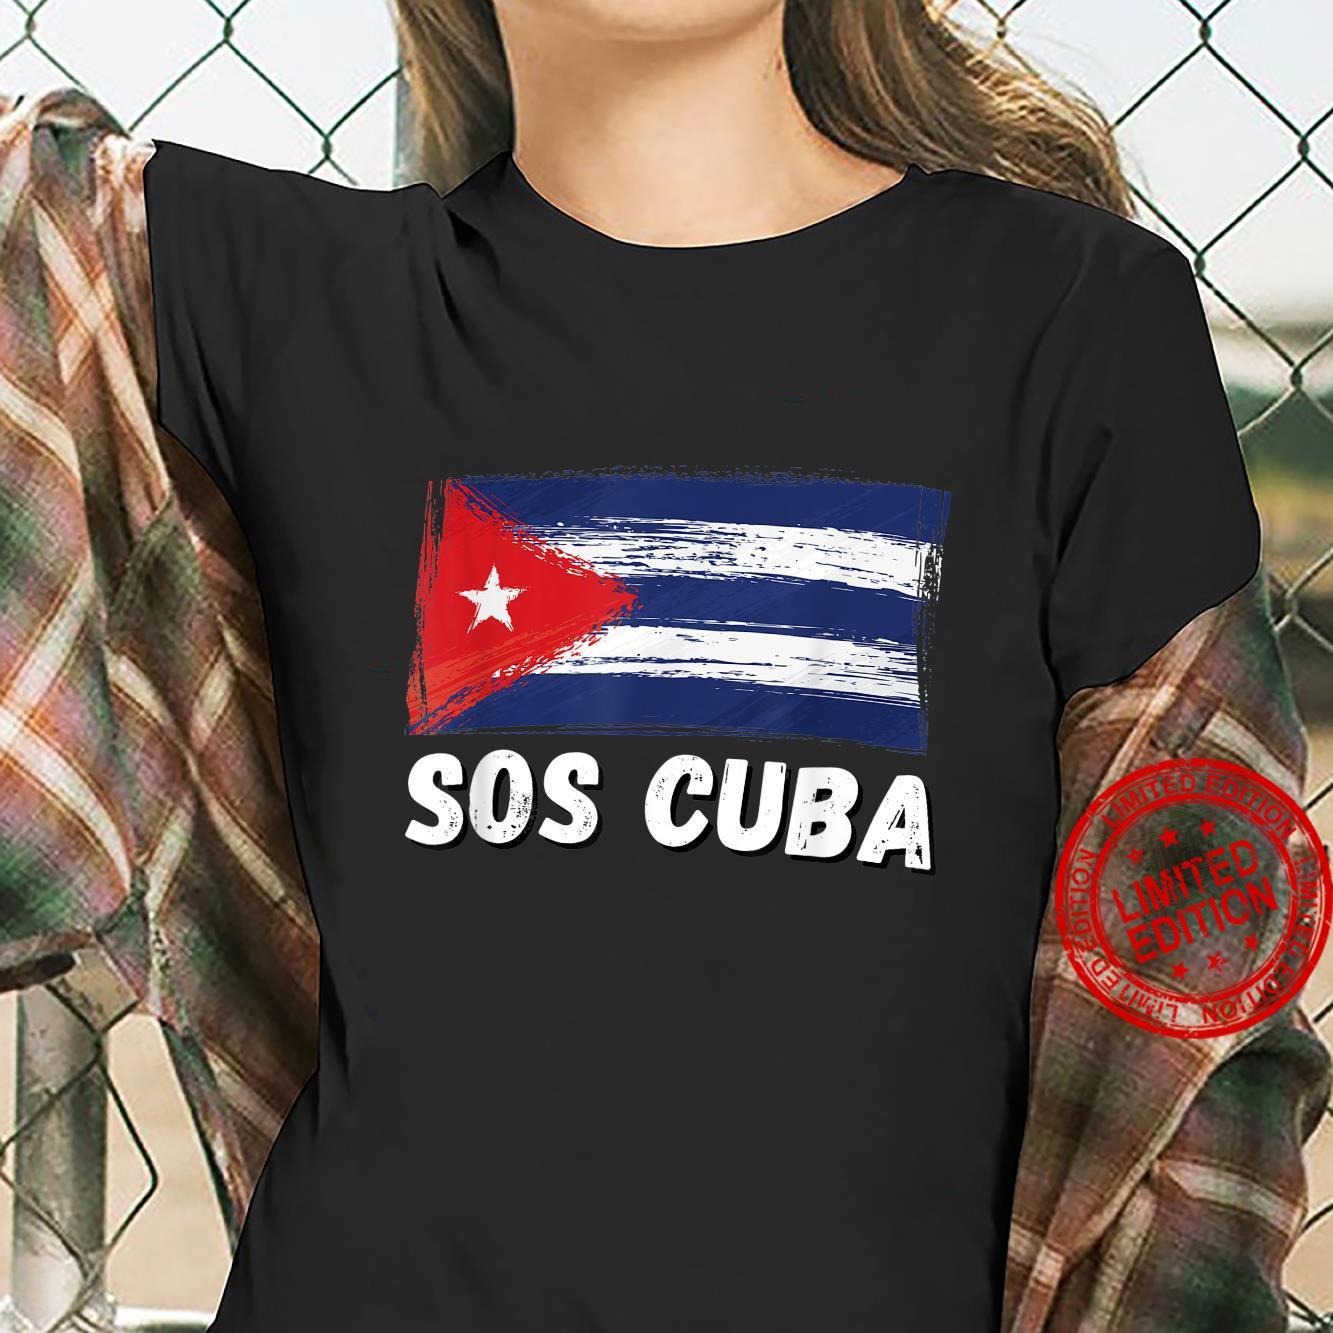 SOS CUBA Shirt, We Stand With Cuba, Support Save Free Cuba Shirt ladies tee